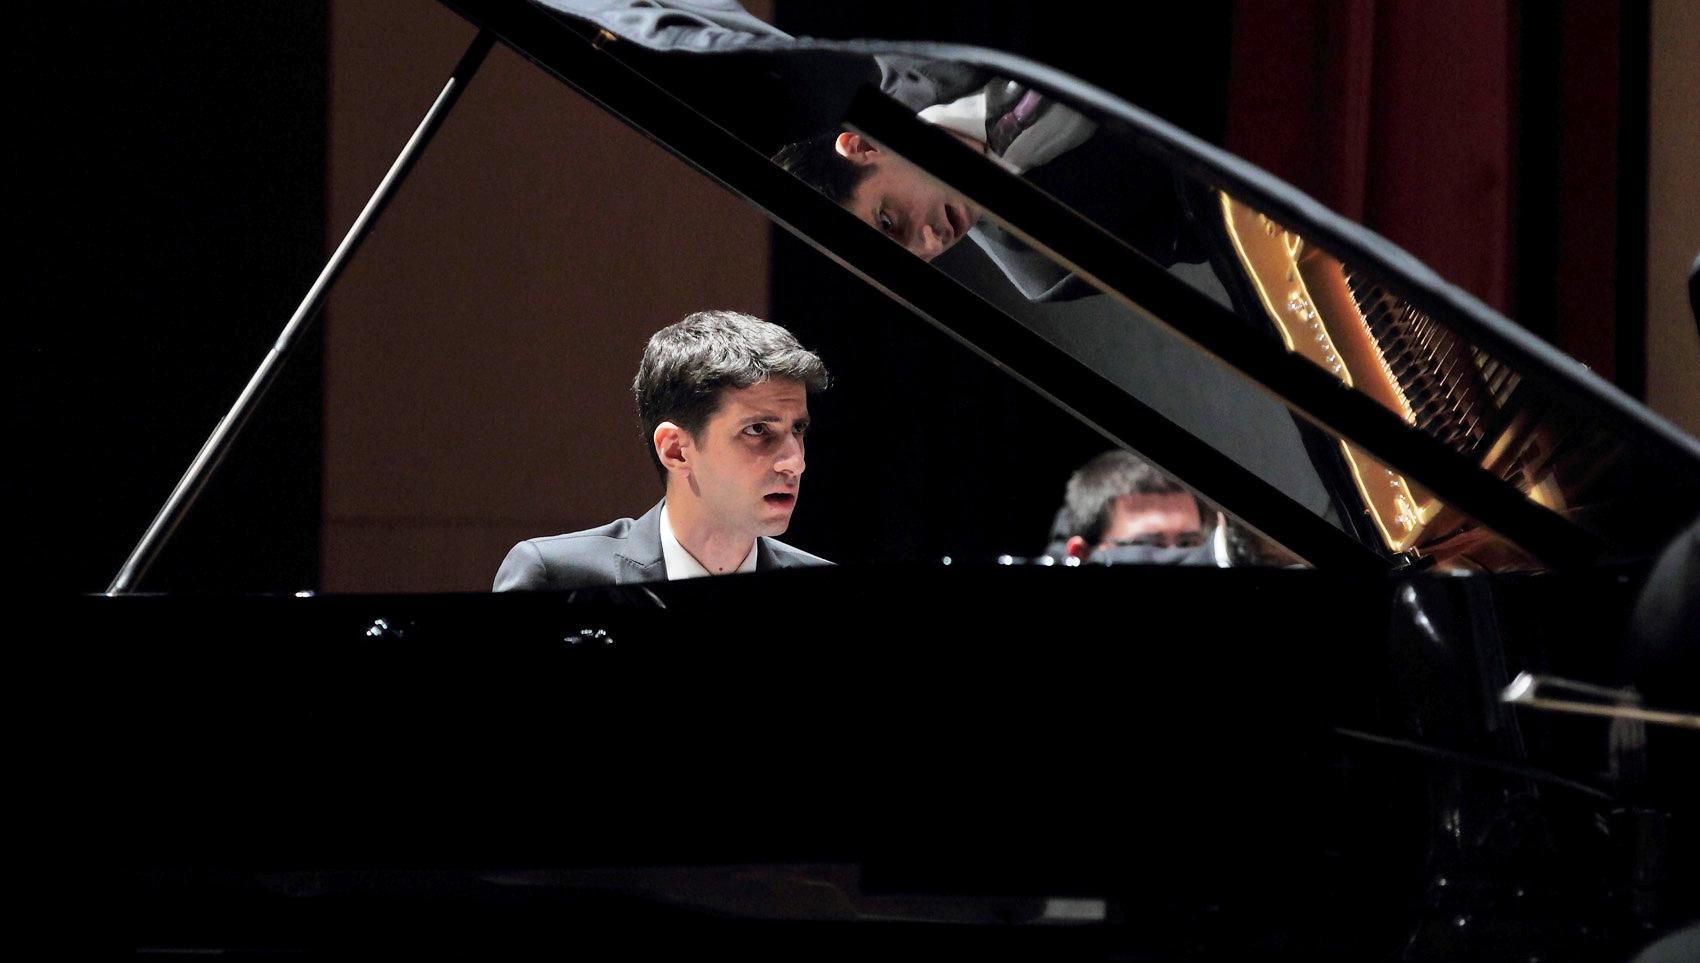 Pianista ofrecerá variado programa con obras de Schumann, Ravel, Bartók, Bach, Brahms y Mussorgsky